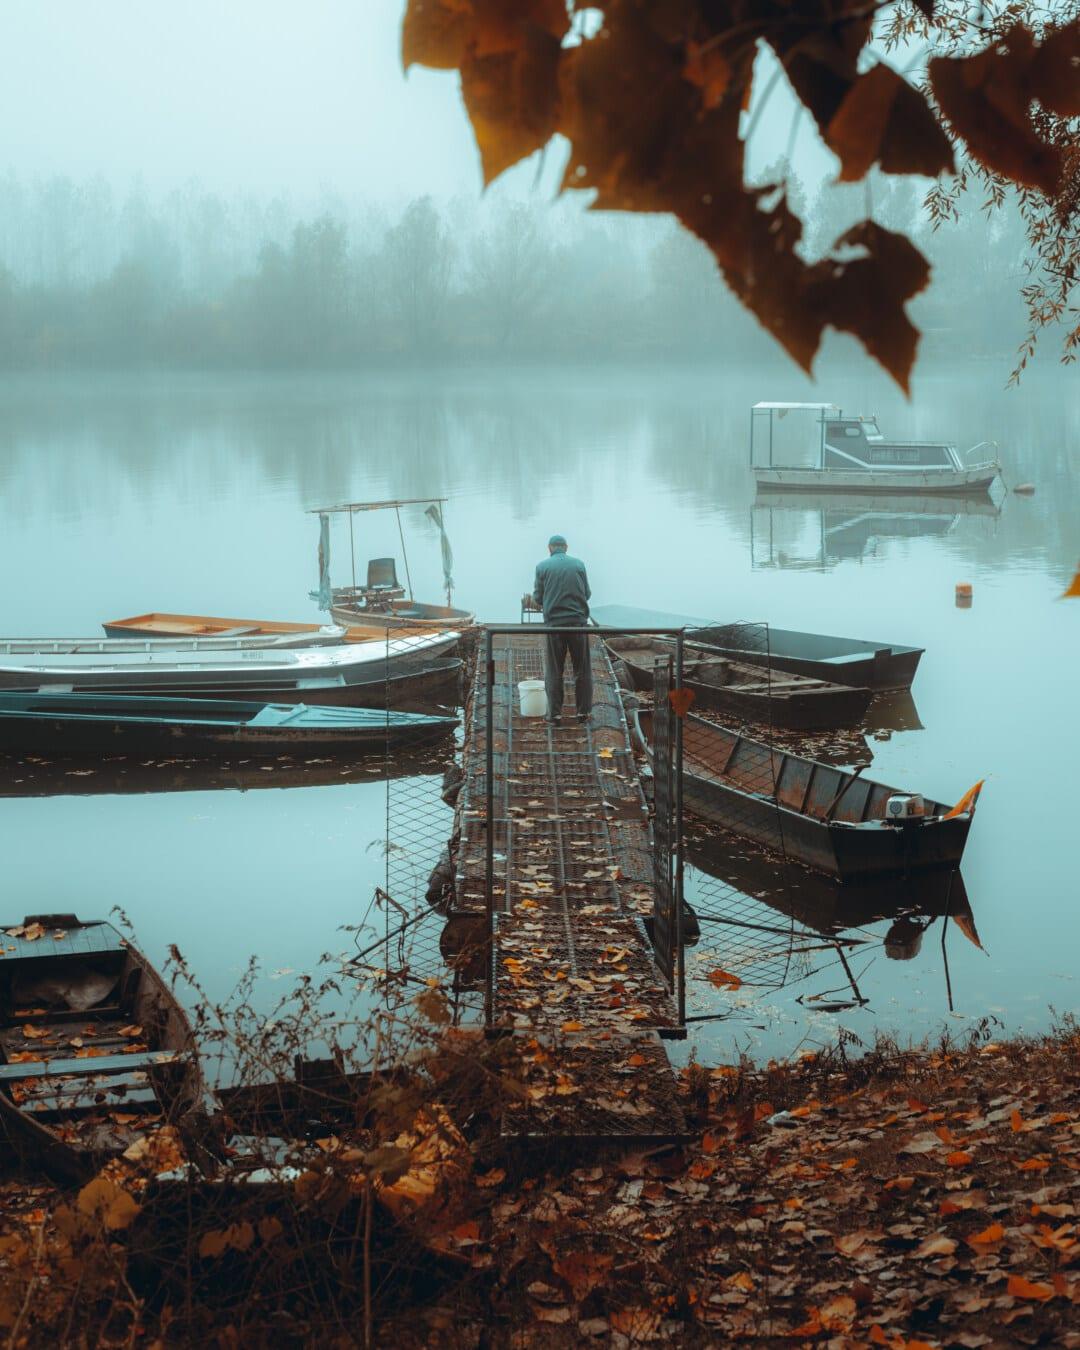 Boote, Seebrücke, Angelboot/Fischerboot, schlechtes Wetter, neblig, Mann, Herbstsaison, Winter, Wasser, See